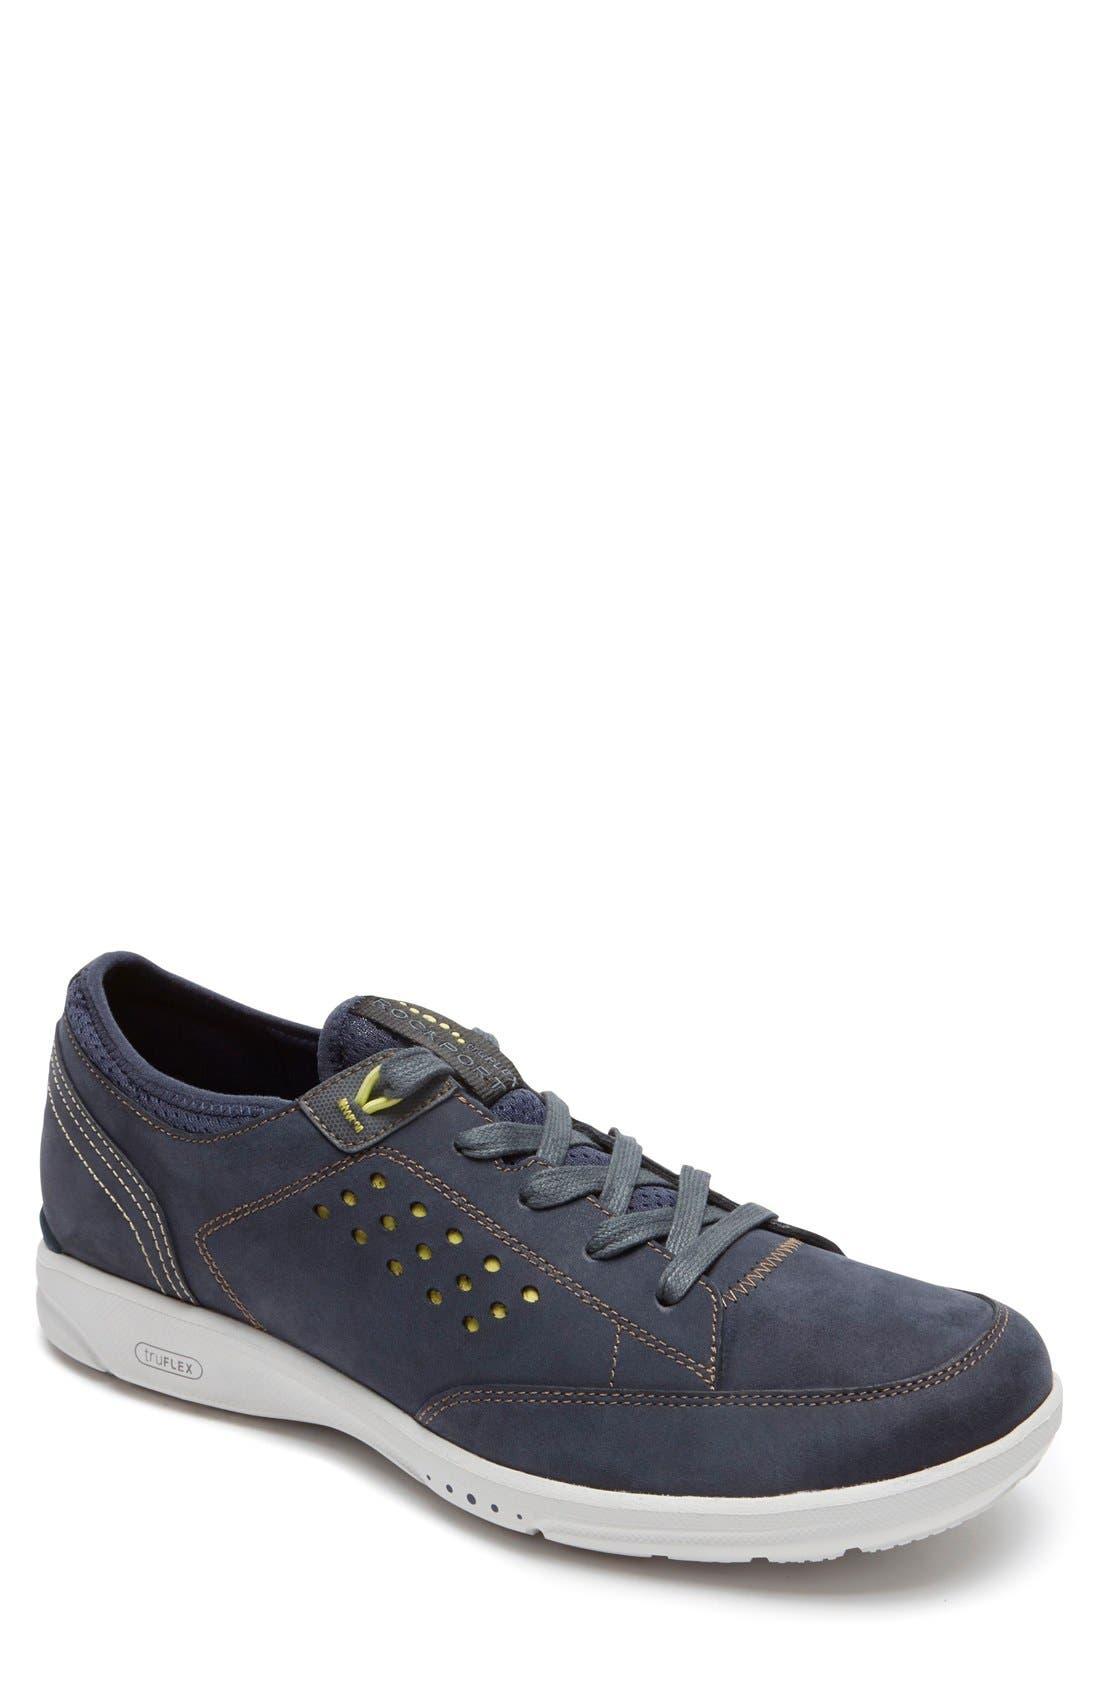 Truflex Sneaker,                             Main thumbnail 1, color,                             New Dress Blues Nubuck